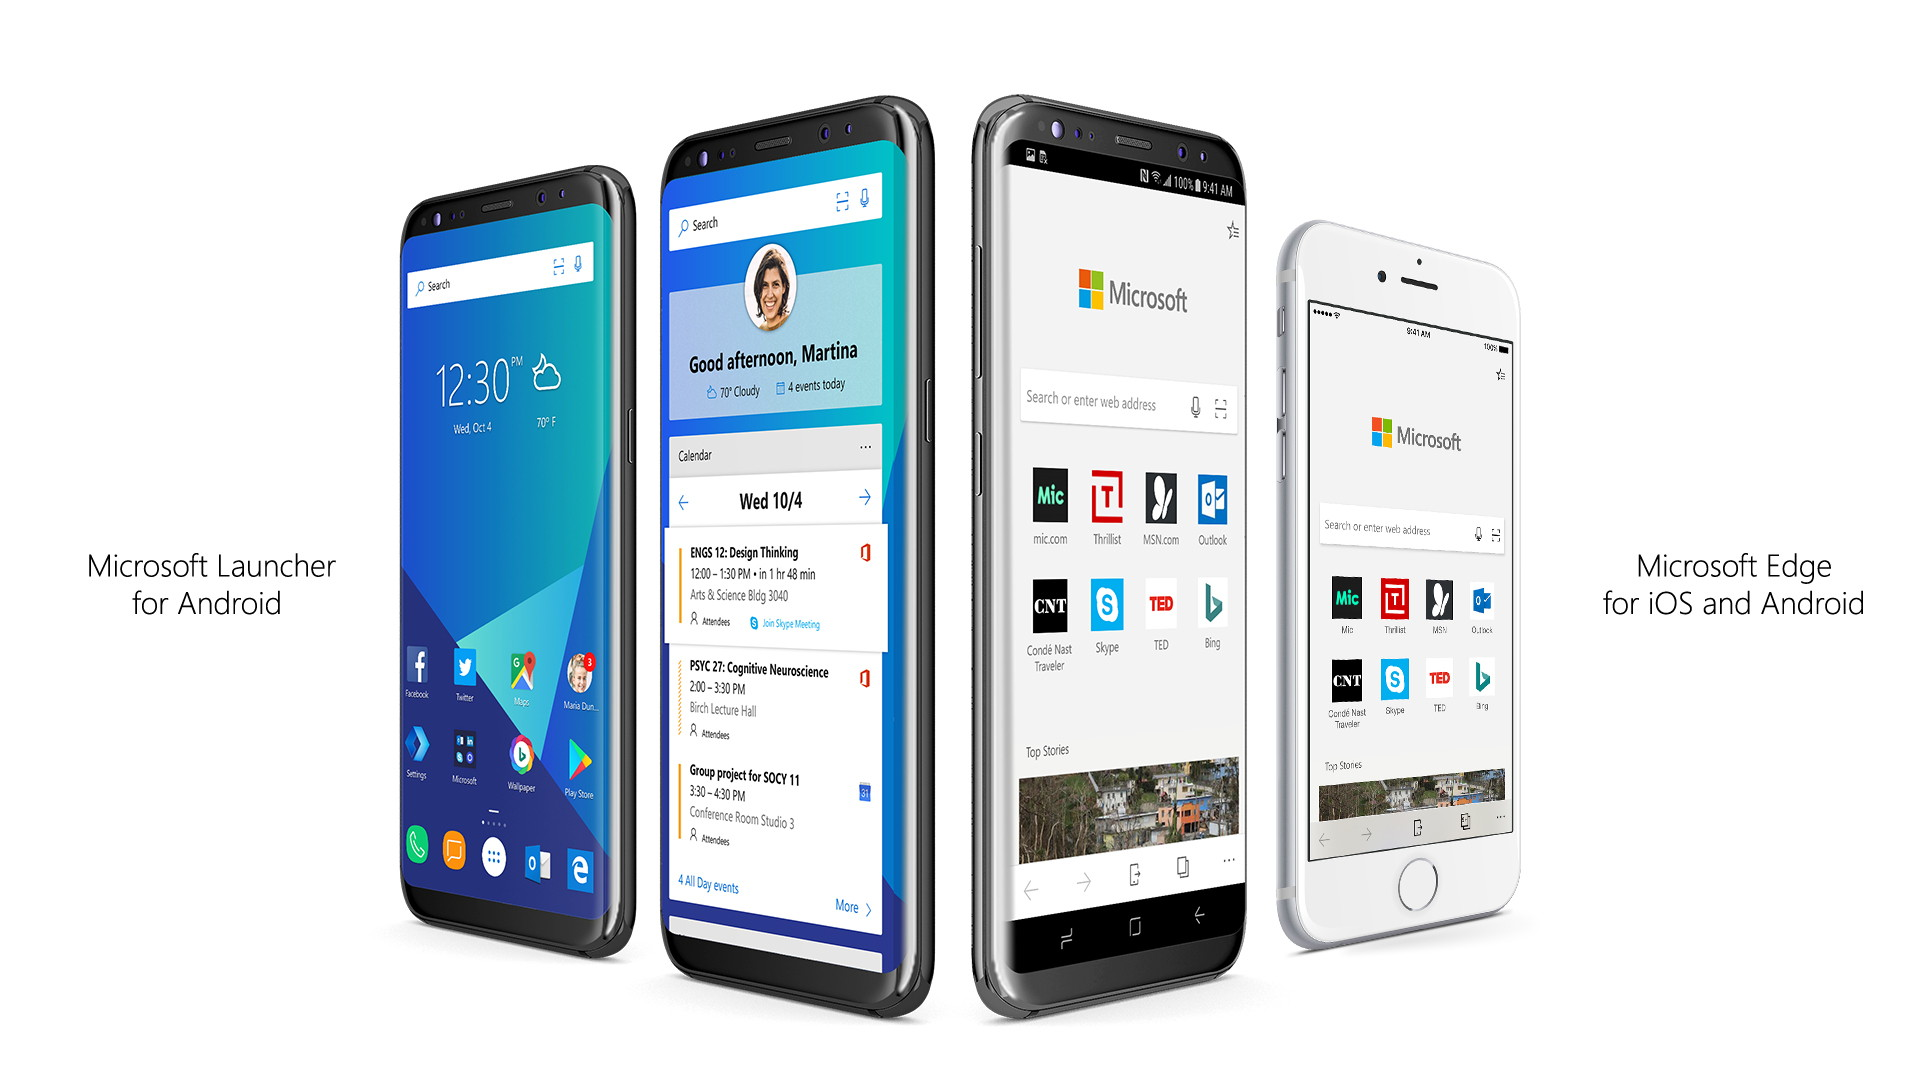 Microsofts Edge kommt aufs iPhone und Android